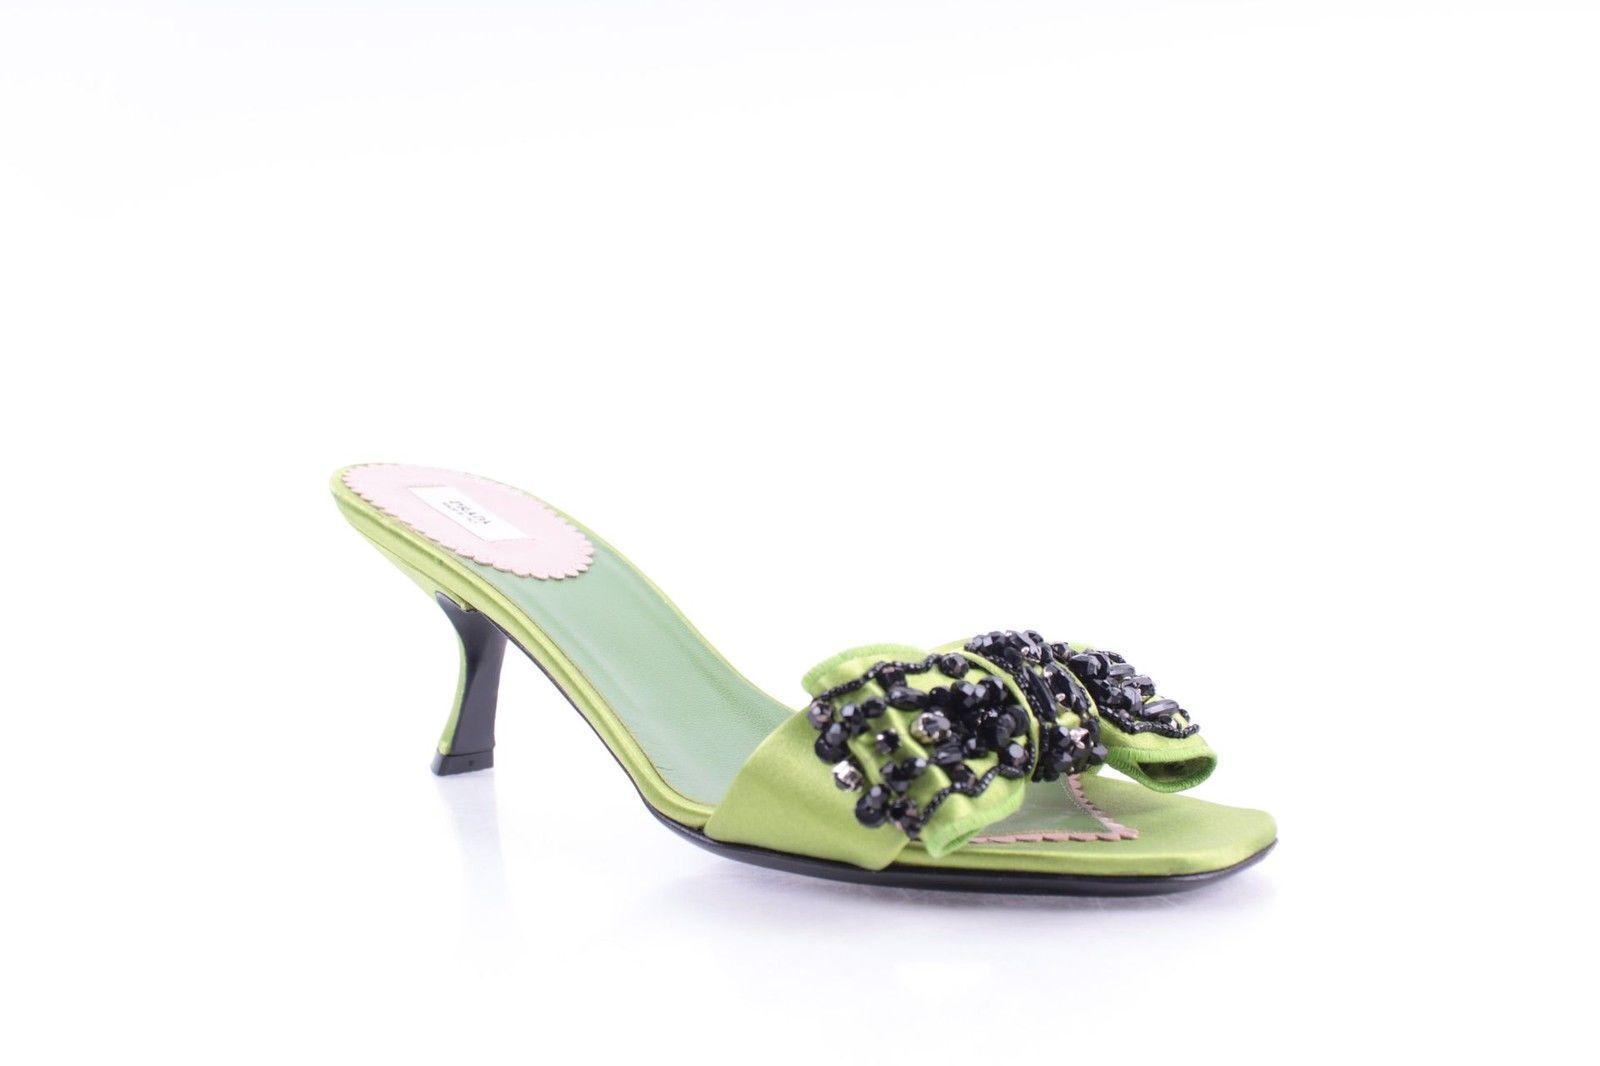 Womens - PRADA - Green Satin Beaded Bow Trim Kitten Heel Slides Sandals 6 36